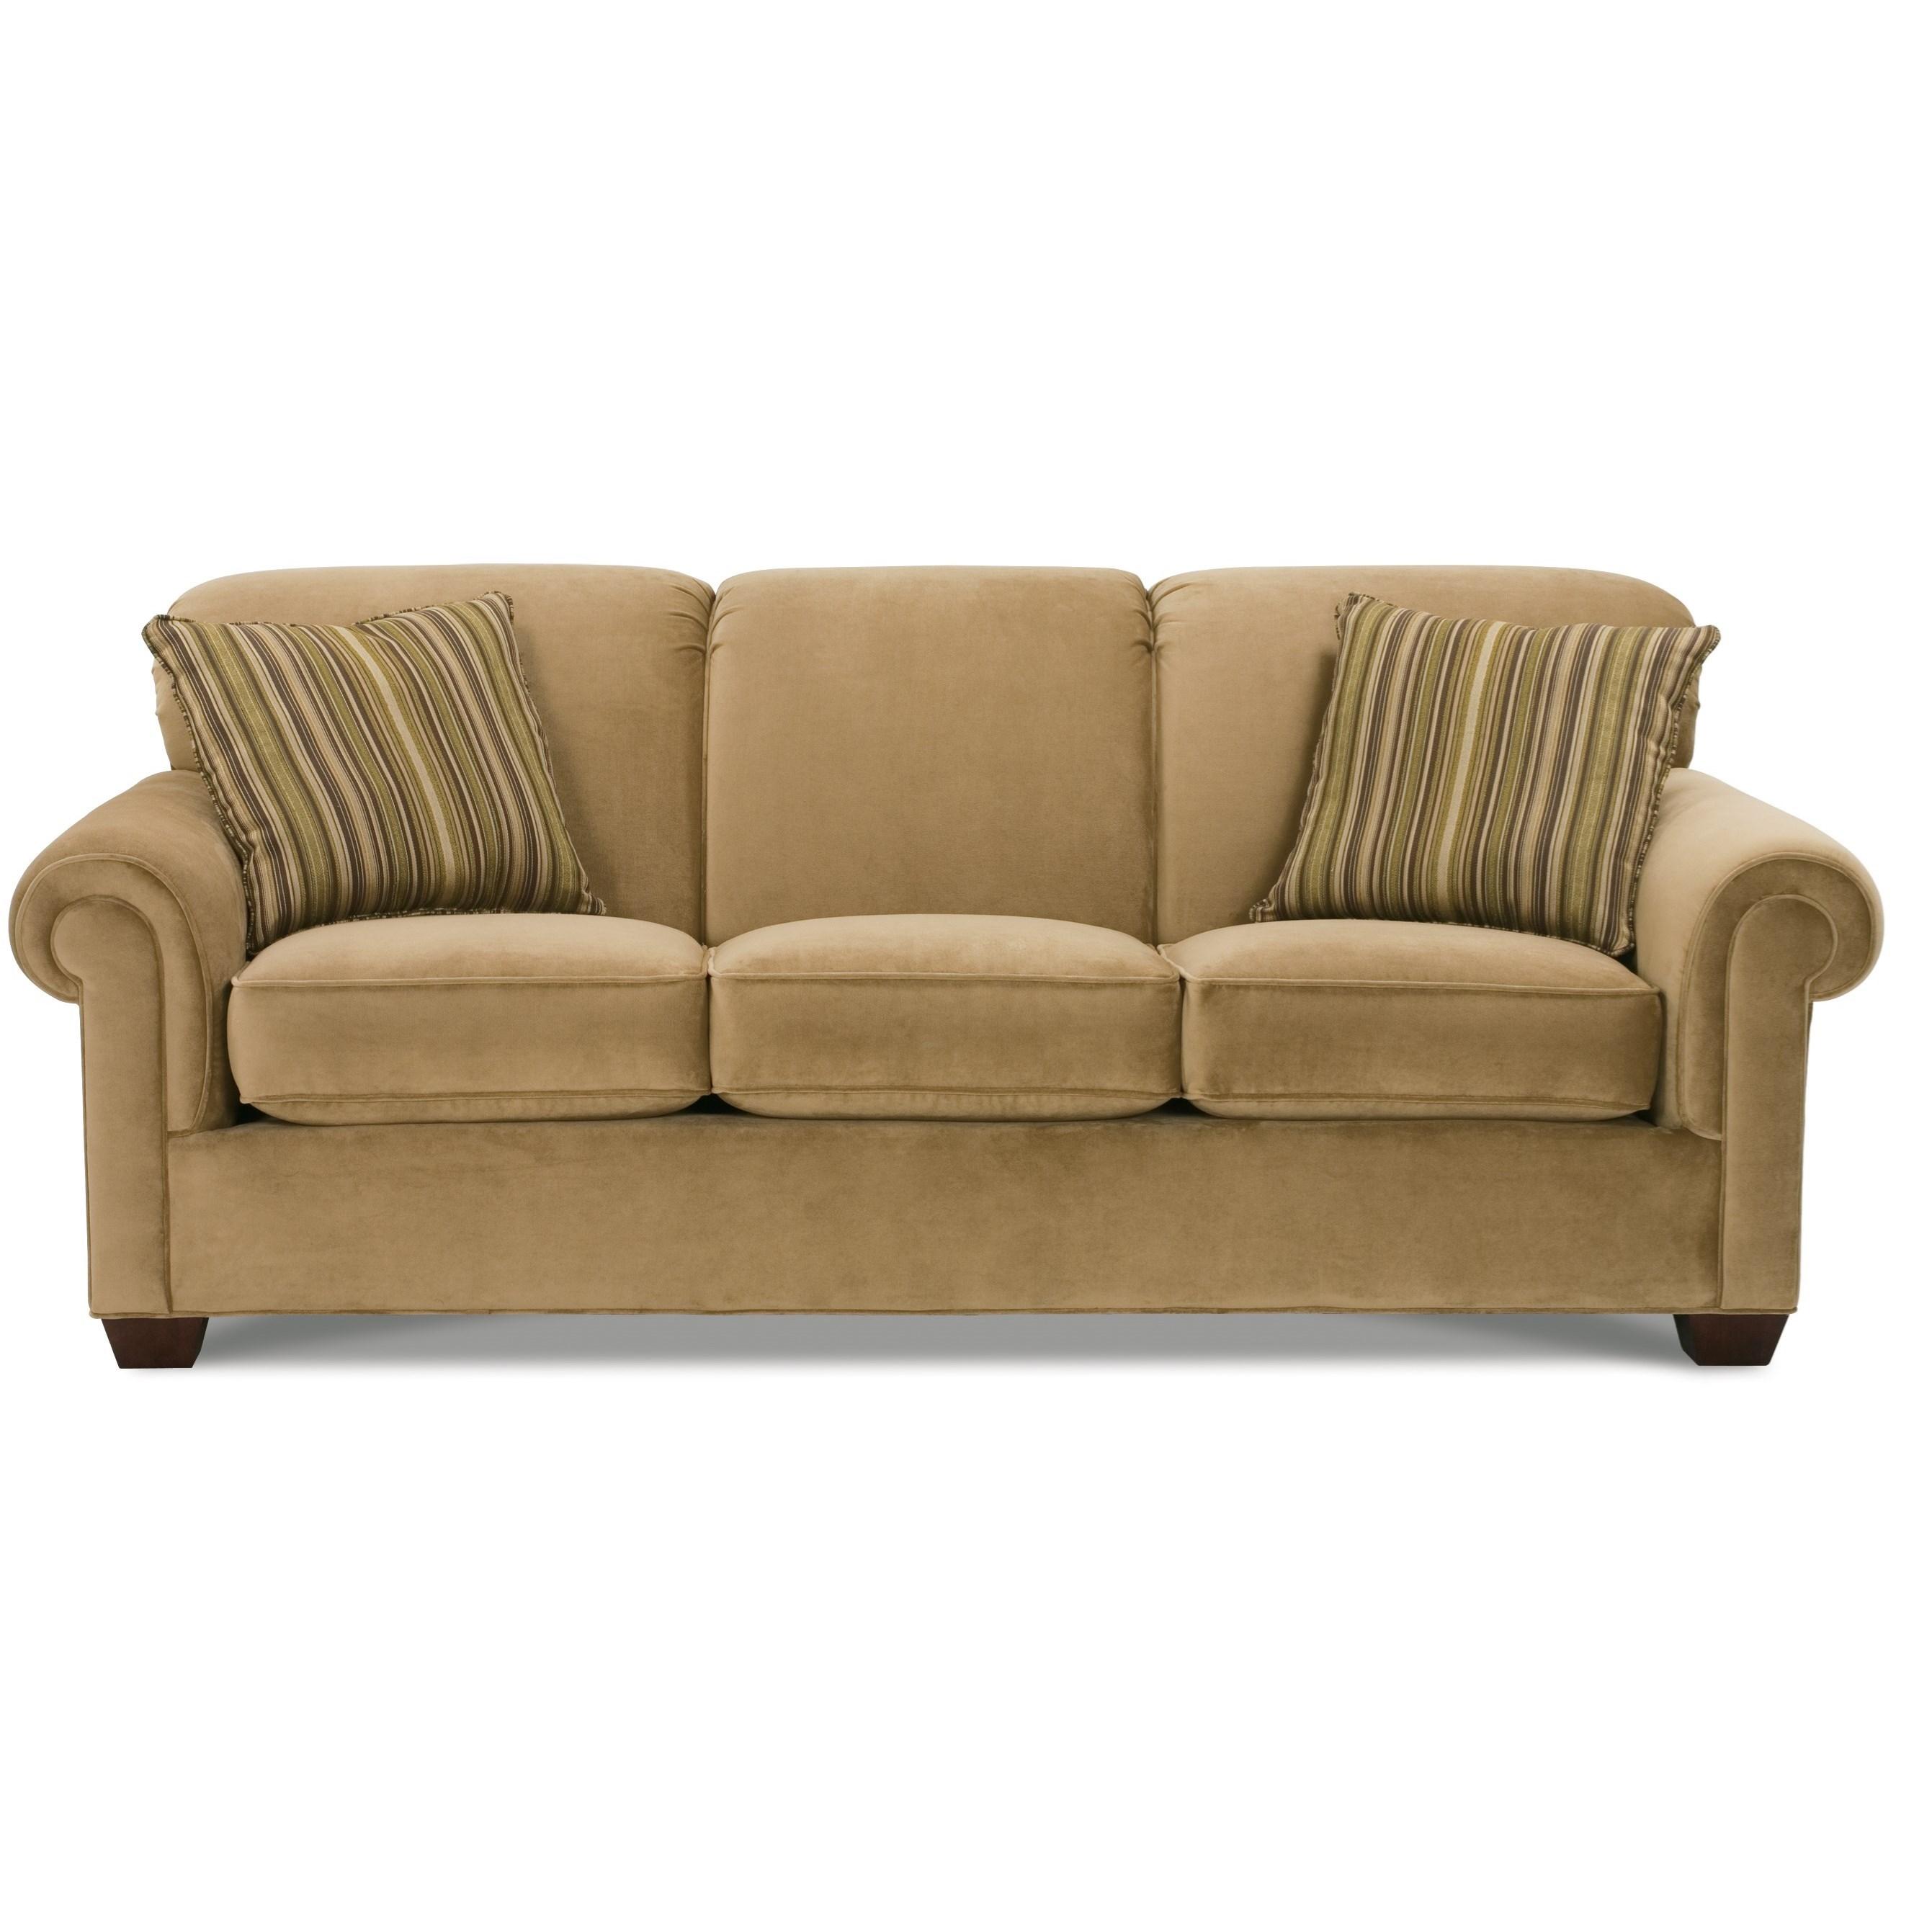 Woodrow Sofa Sleeper by Rowe at Steger's Furniture